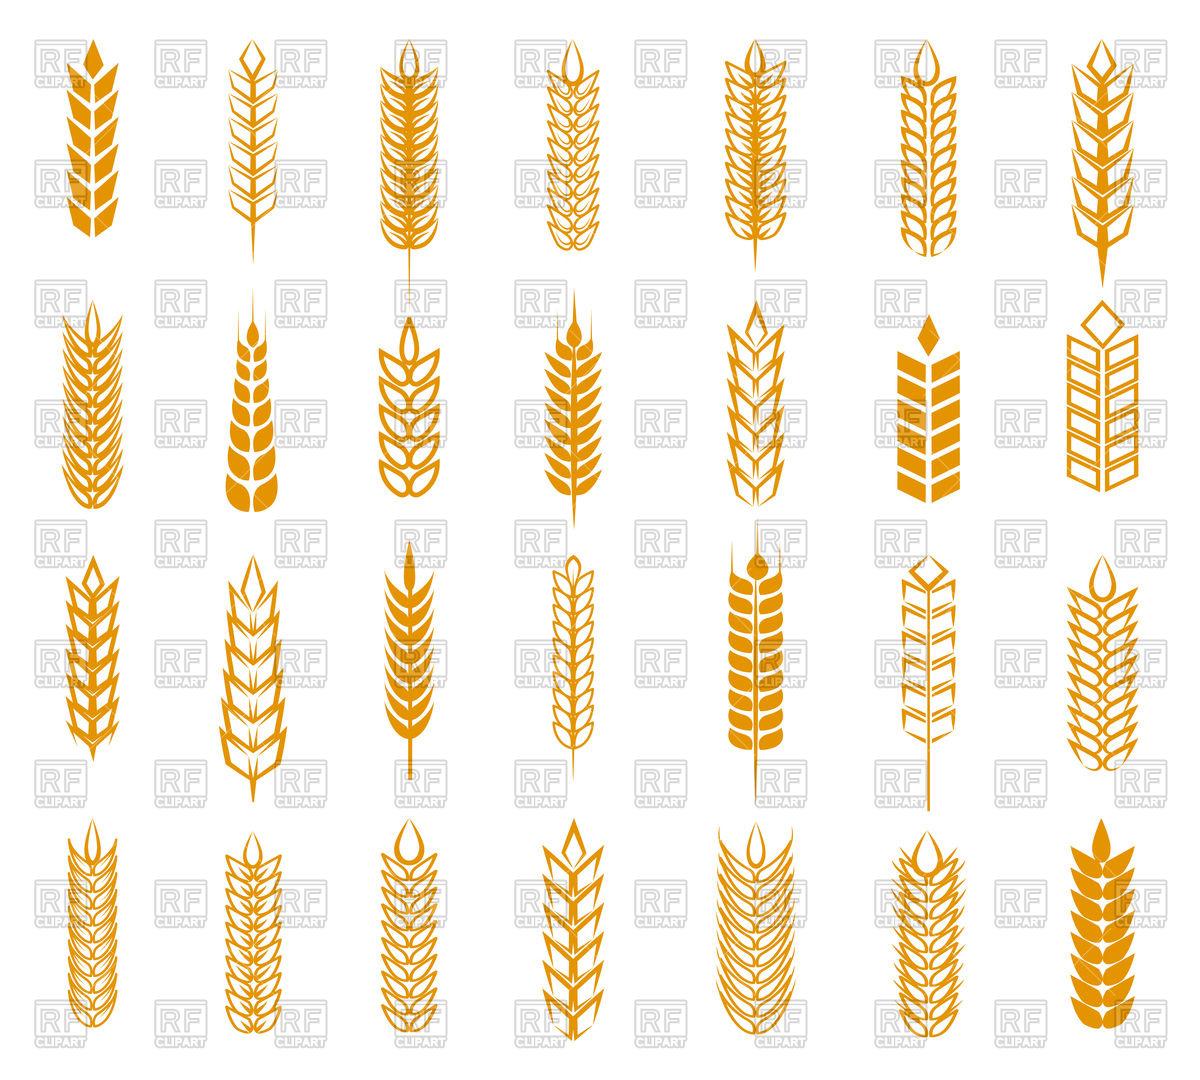 1200x1080 Wheat, Rye And Barley Ear Set Vector Image Vector Artwork Of